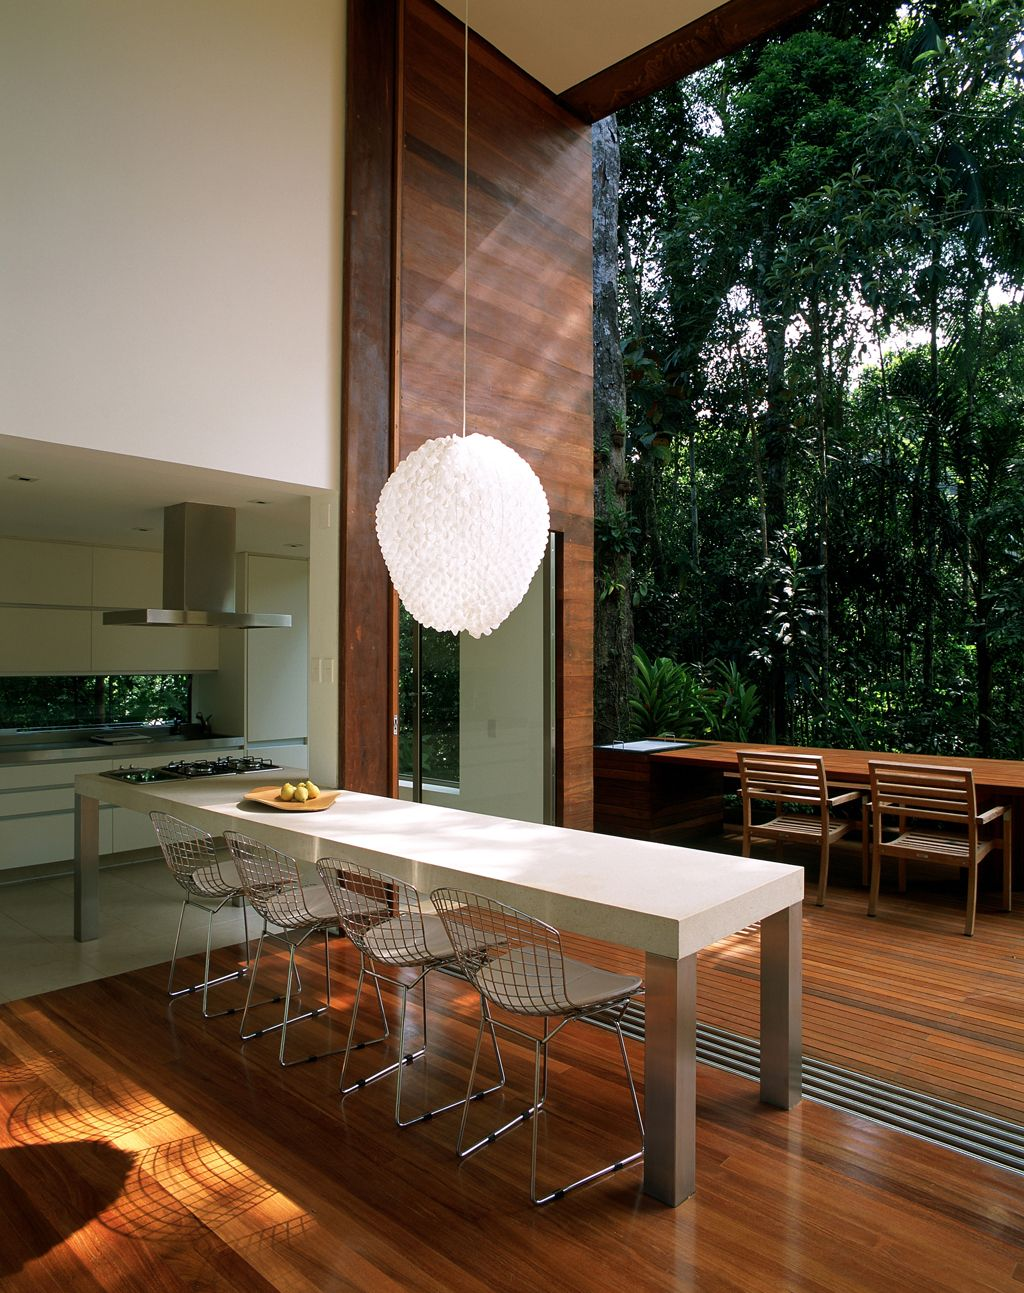 AC Iporanga / Studio Arthur Casas @studioarthurcas #gourmet #kitchen #dining #patio #yard #green